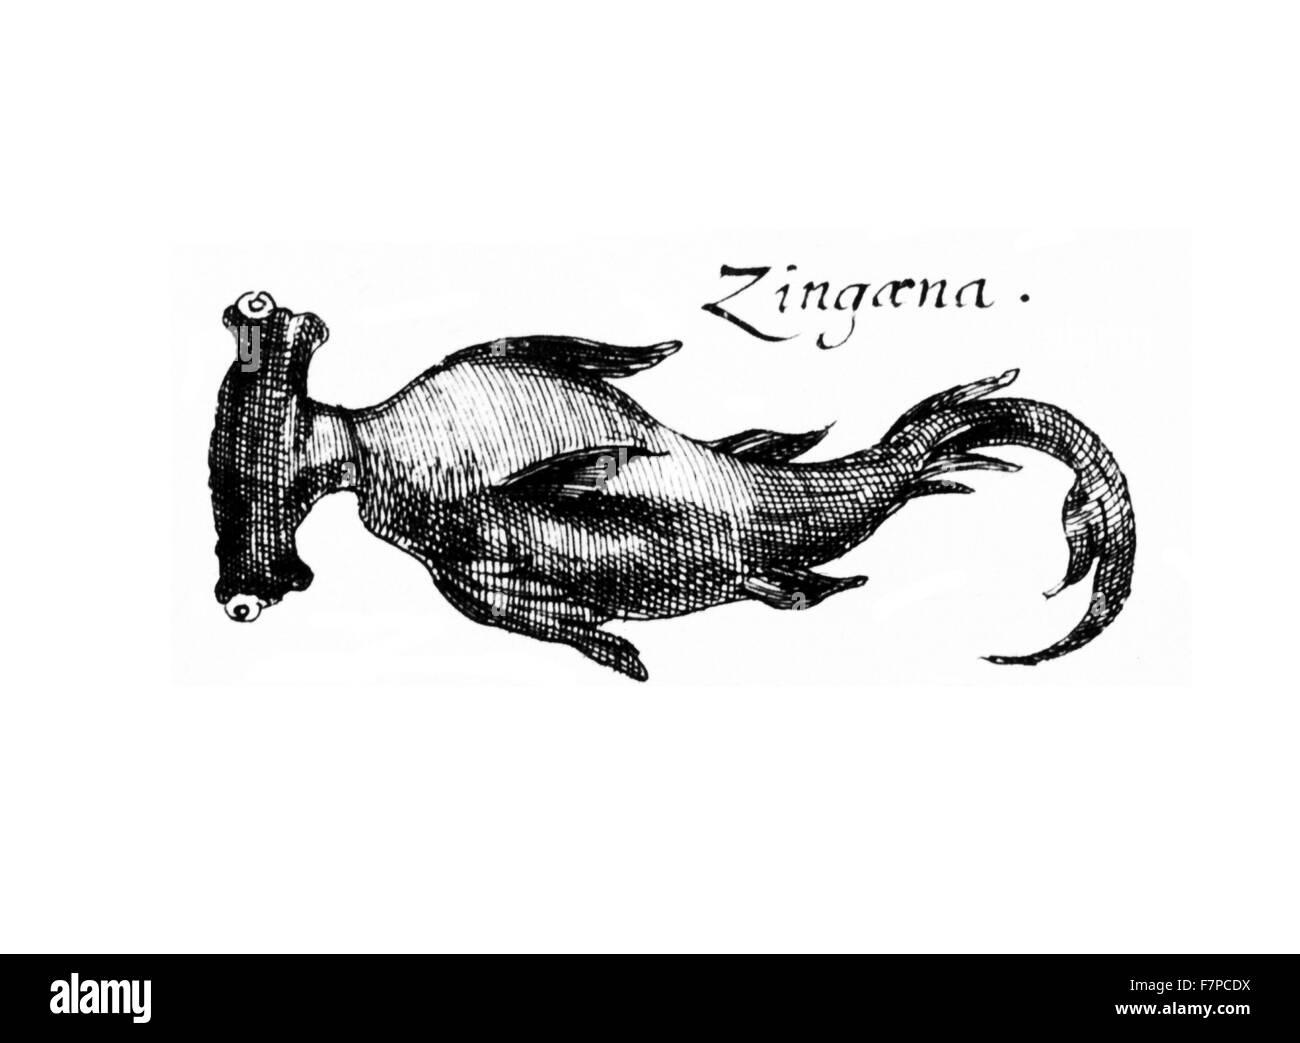 Zingaena fish illustration from 'Specula physico-mathematico-historica' by Johann Zahn.1696 - Stock Image